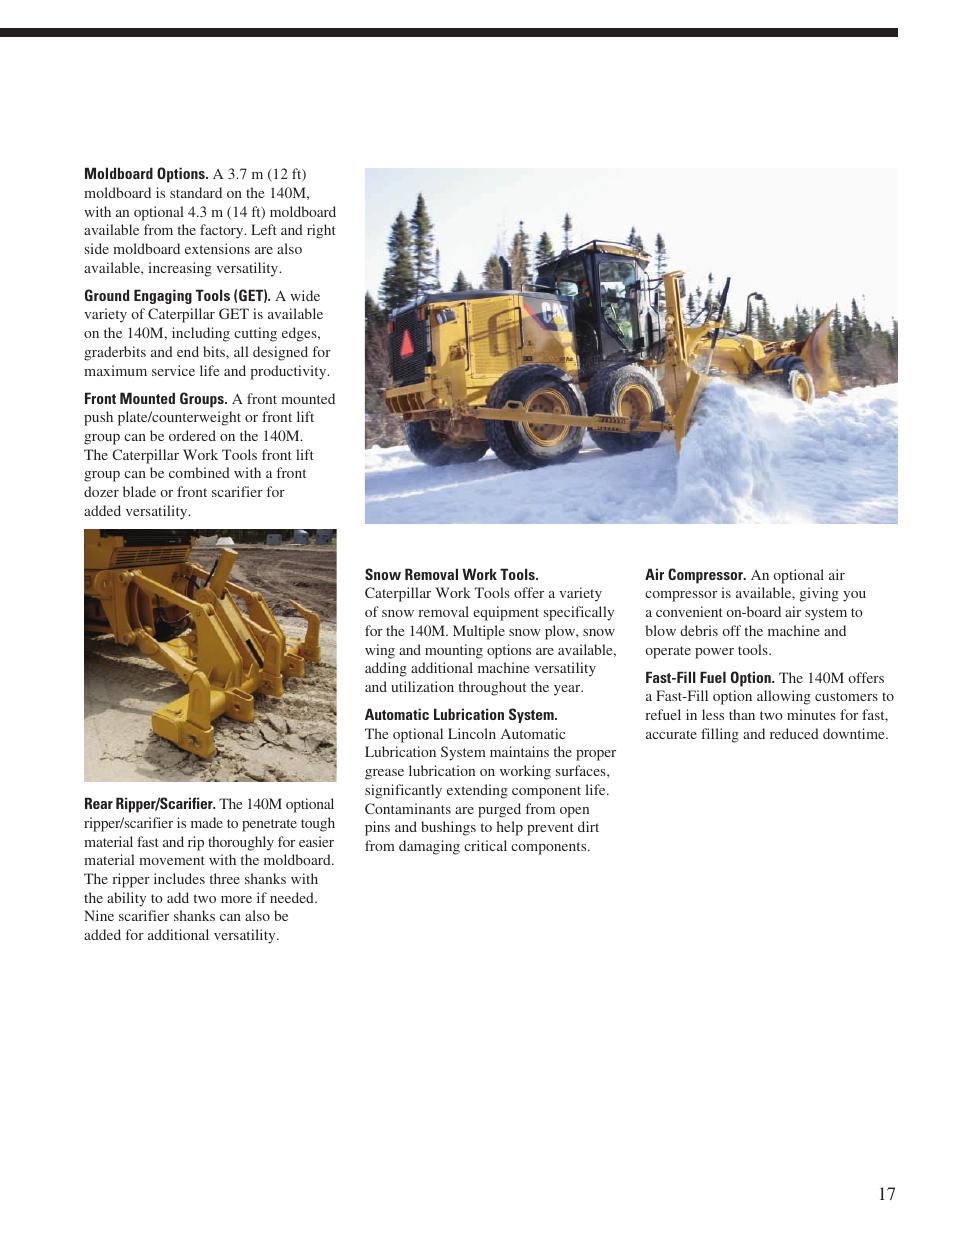 Milton CAT 140M User Manual | Page 17 / 28